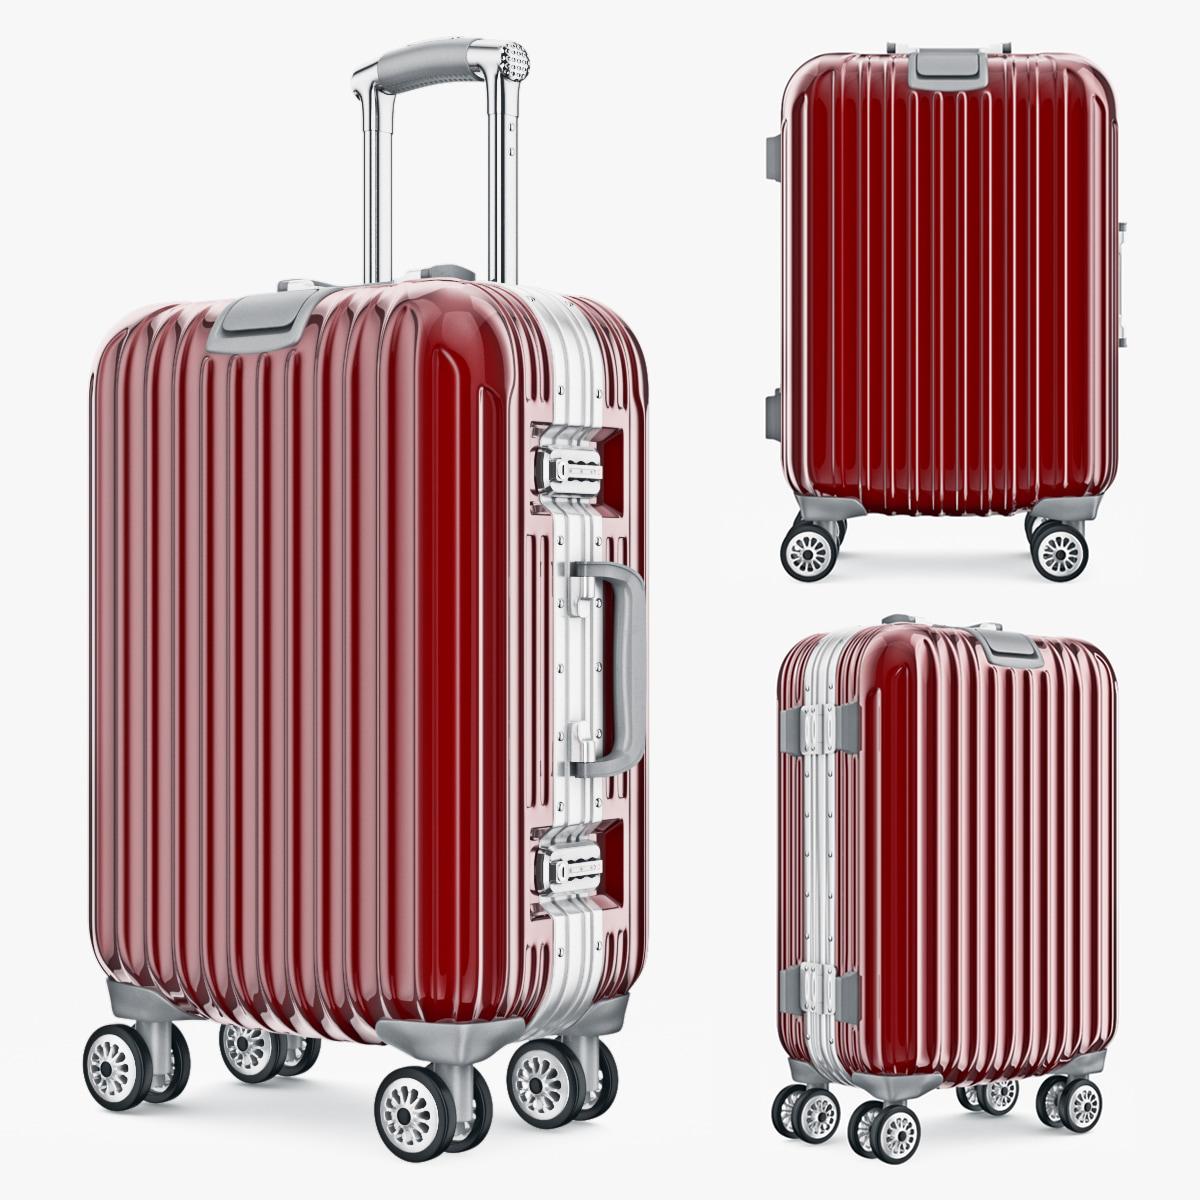 bag luggage travel kingtrip 3d max